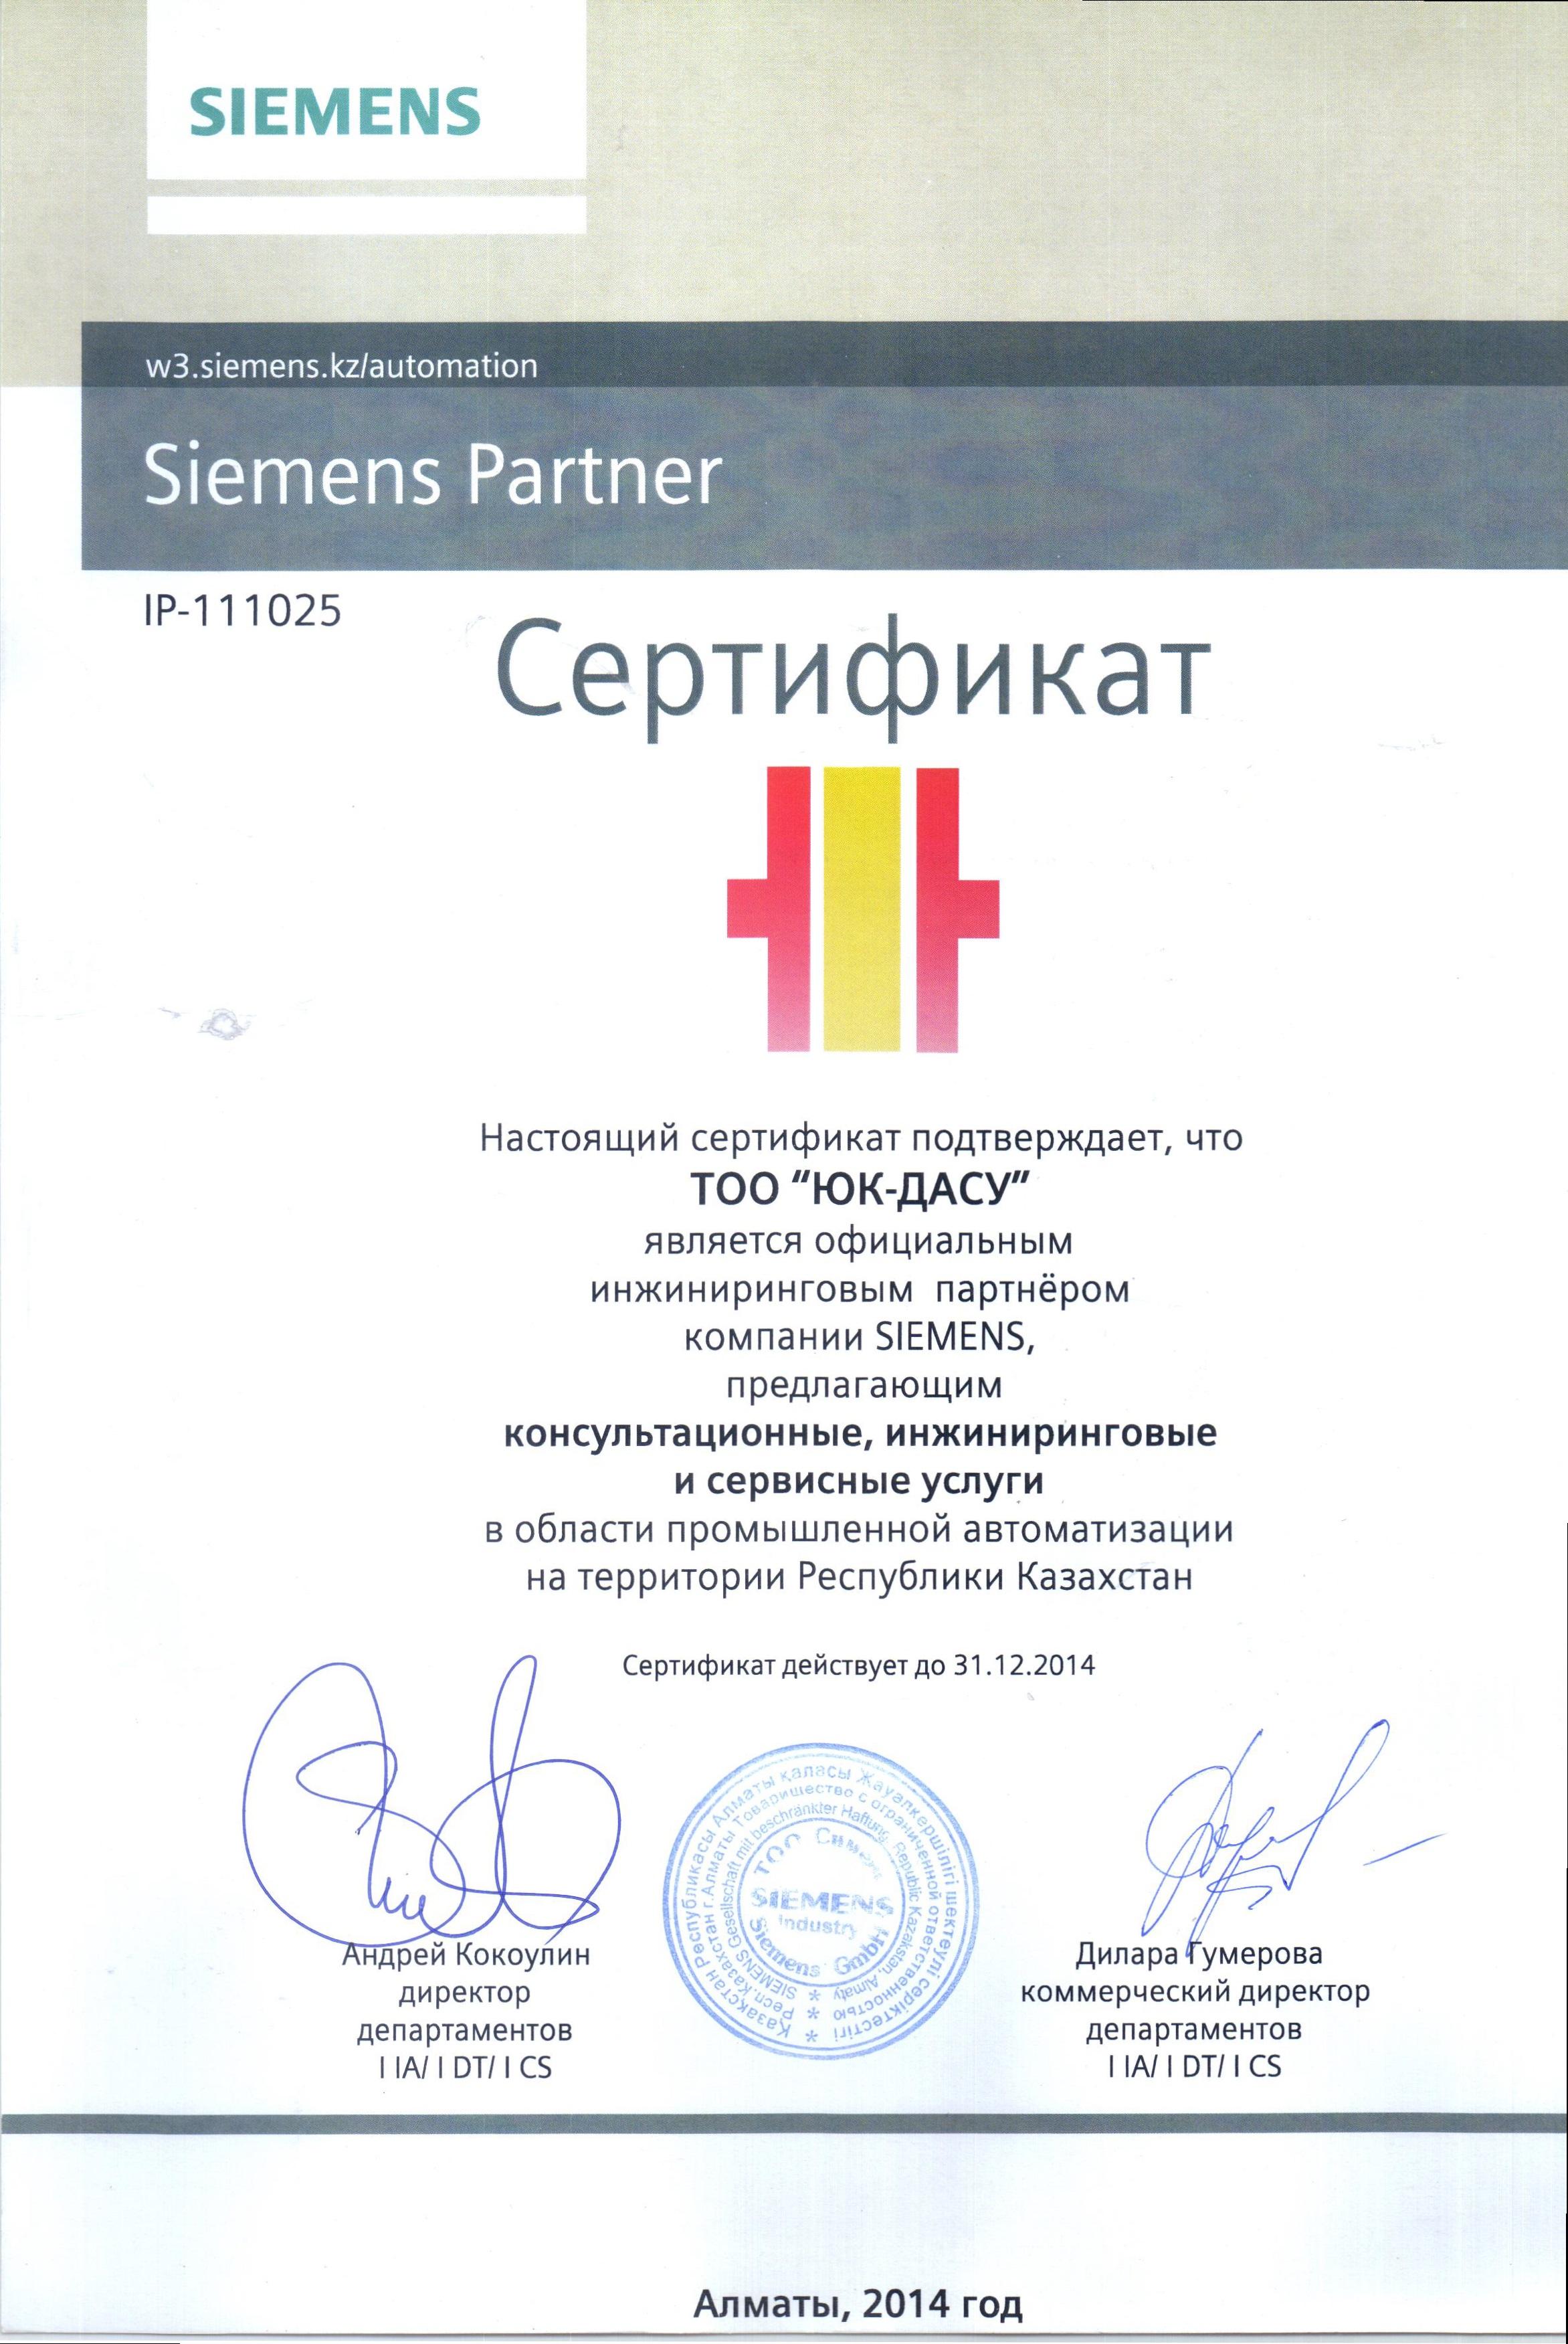 Сертификат от Siemens 2014 г.